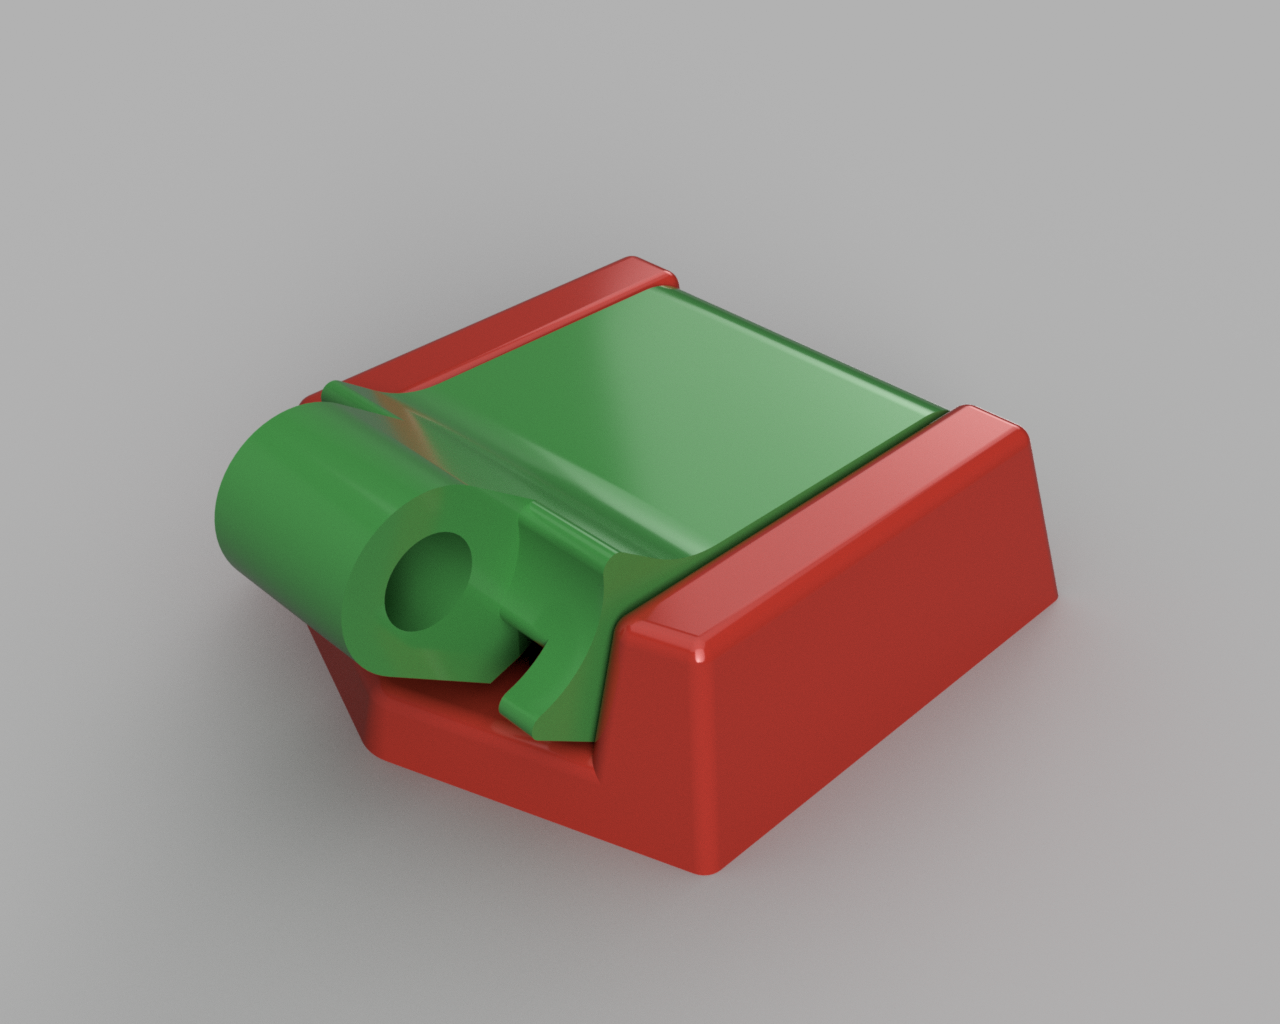 support umbird.png Download STL file Humminbird 525 echo sounder • Template to 3D print, francknos